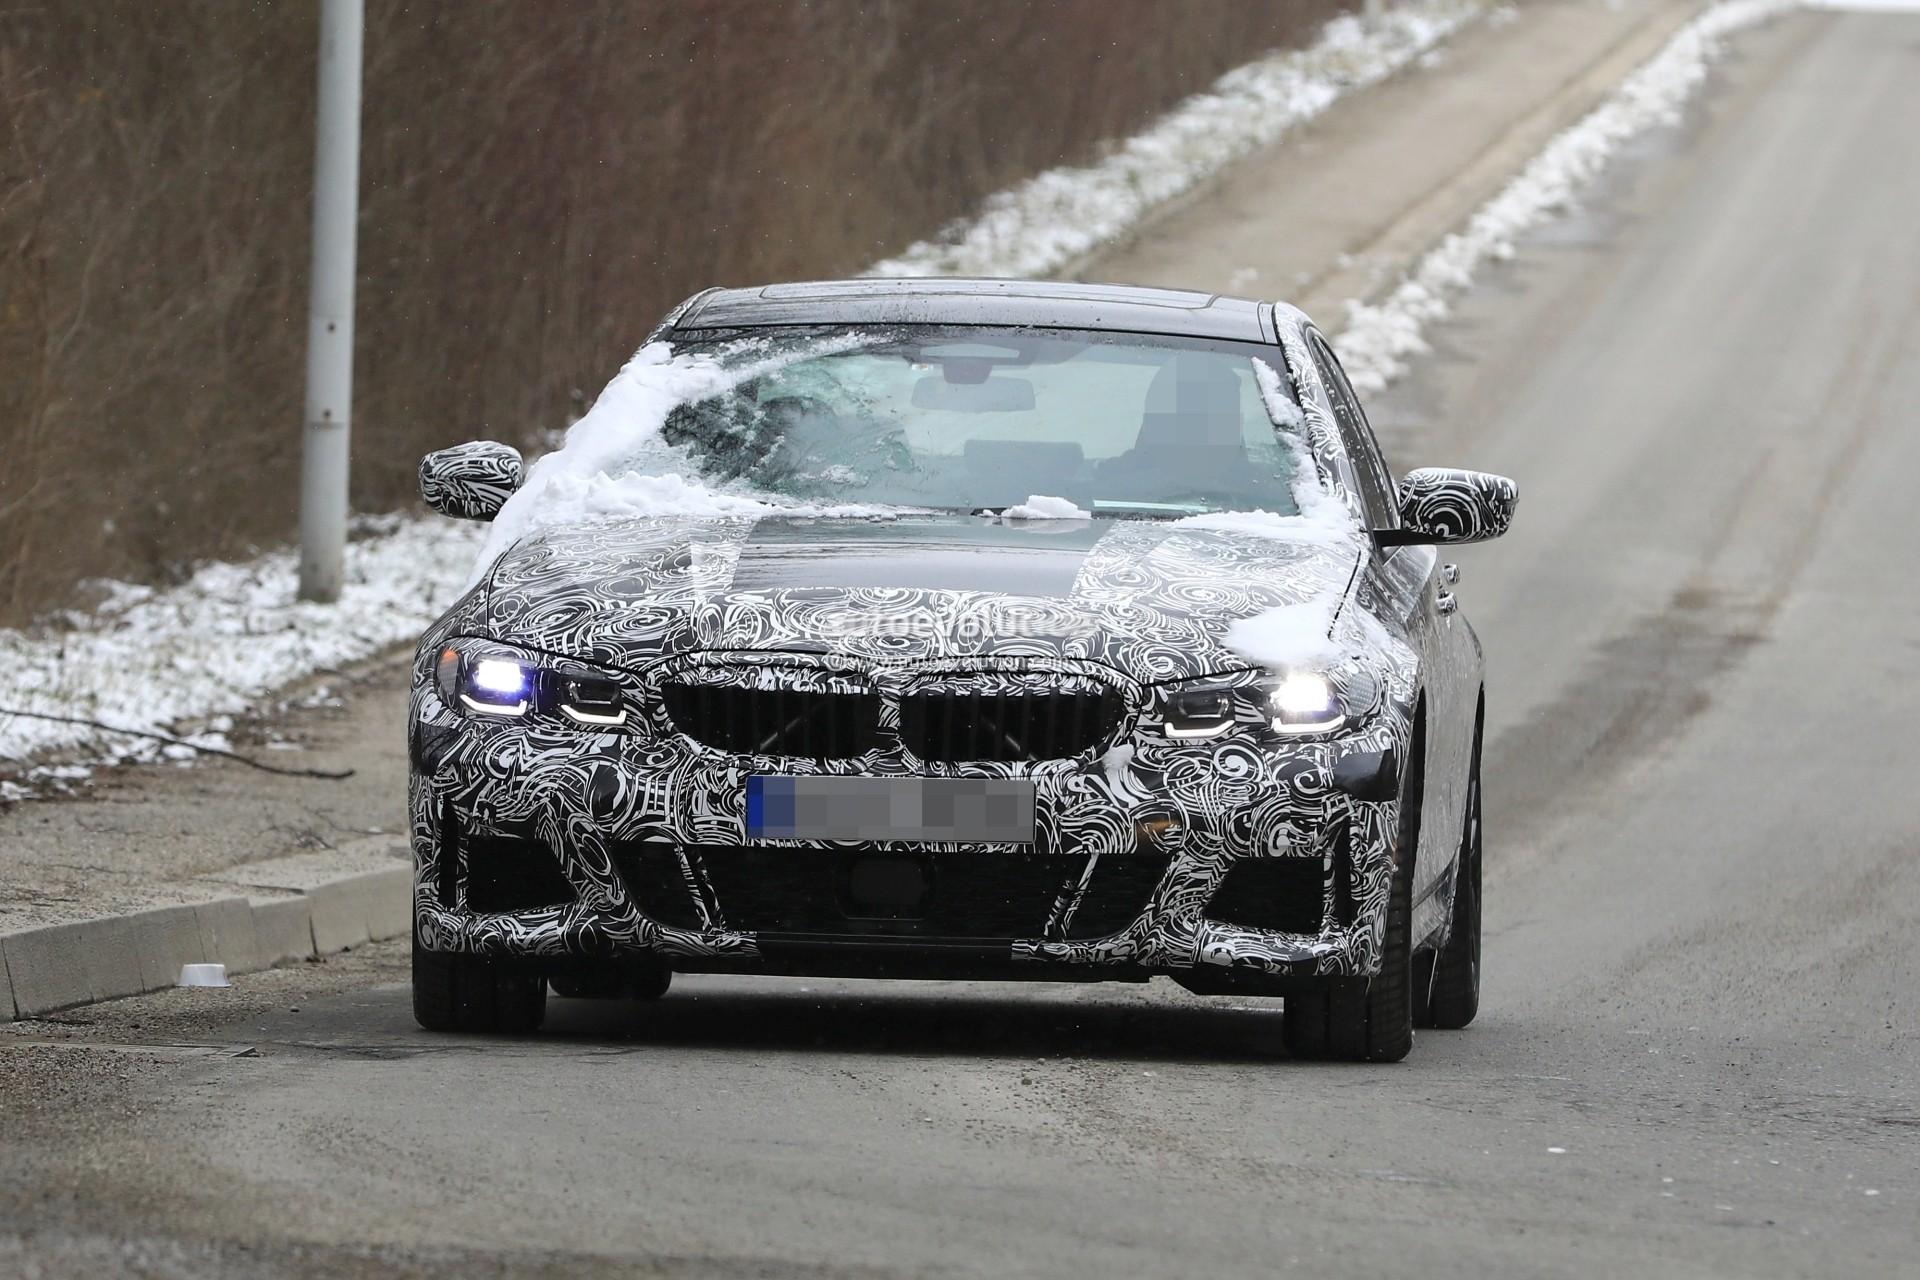 Bmw 3 Series G20 >> Spyshots: 2019 BMW 3 Series Shows Baby 5 Series Look with Sportier Details - autoevolution